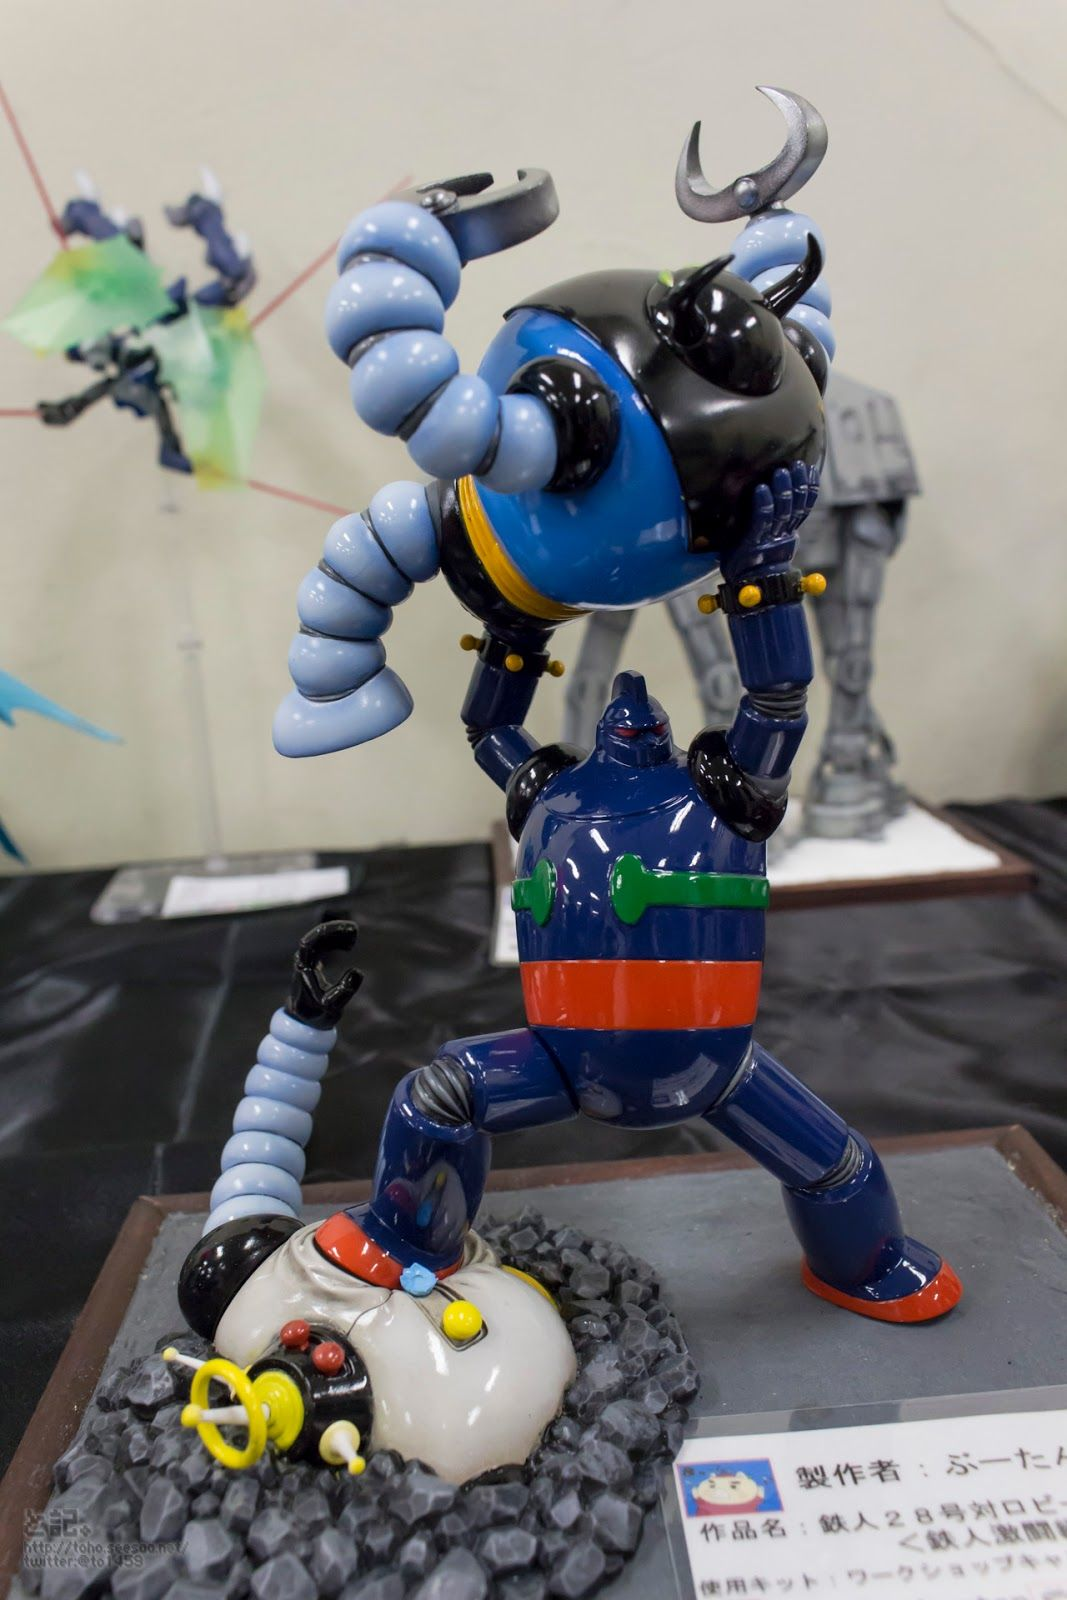 Cpm Asakusabashi Plastic Model Exhibition Tokyo Japan Image Gallery Part 11 Japan Image Art Toy Japanese Robot